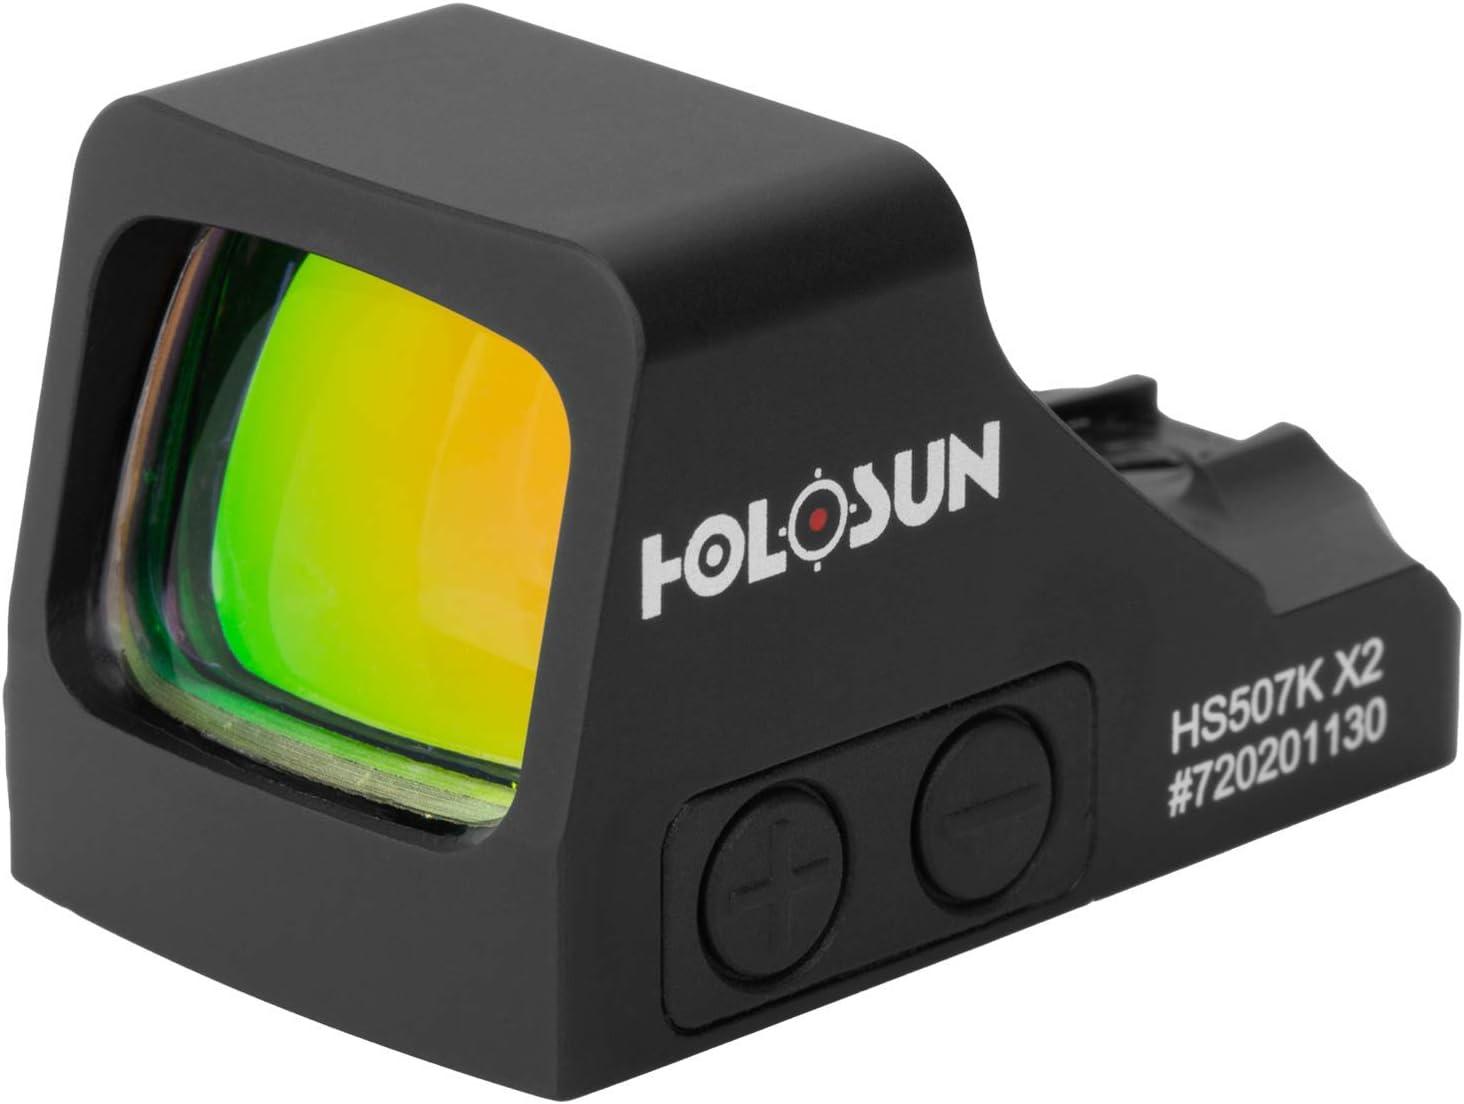 HOLOSUN - HS507K-X2 Classic Multi SALENEW大人気! デポー Sight Dot Red Black Reticle